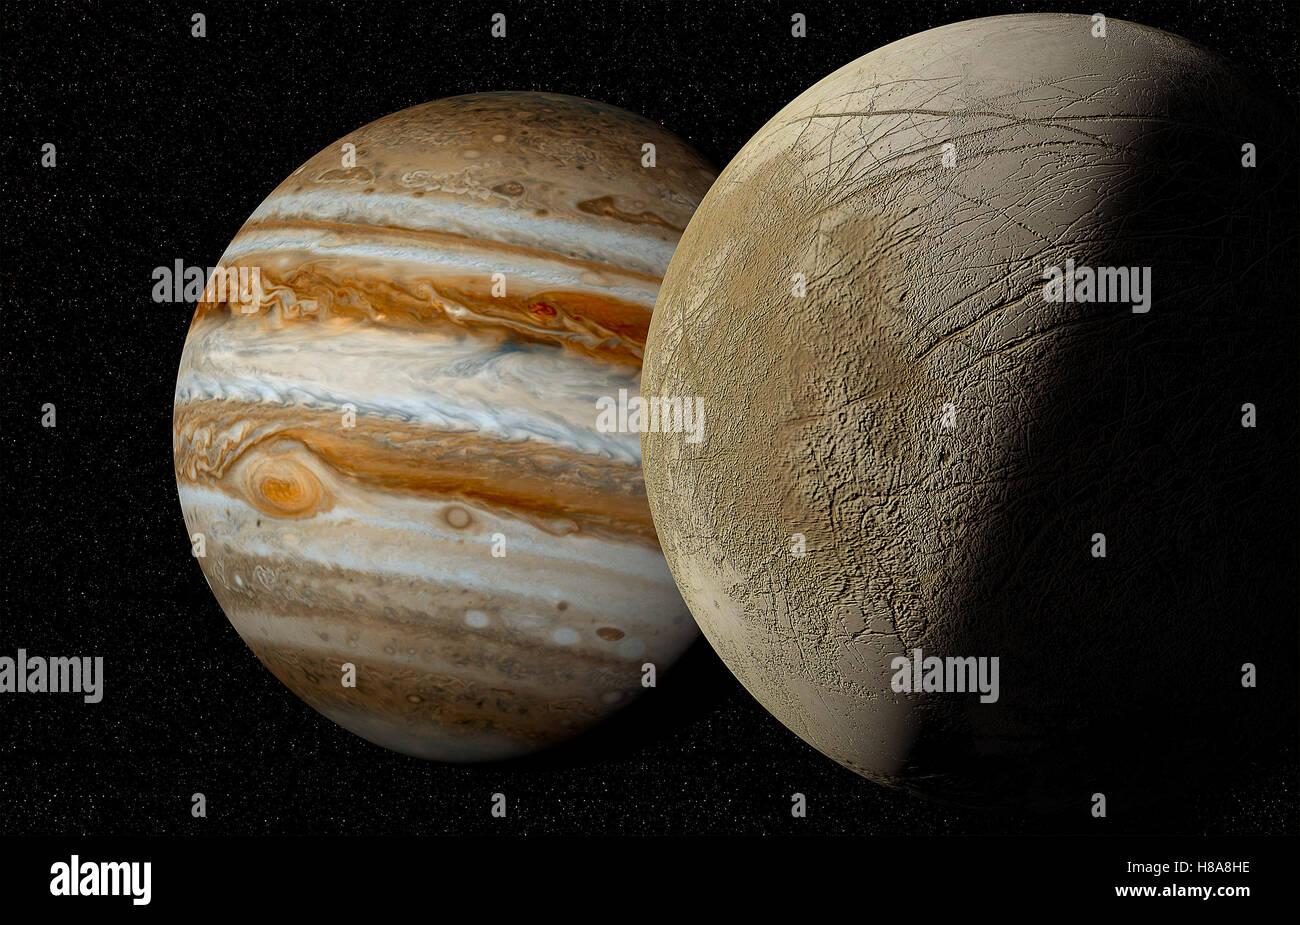 jupiter and moon Europa - Stock Image